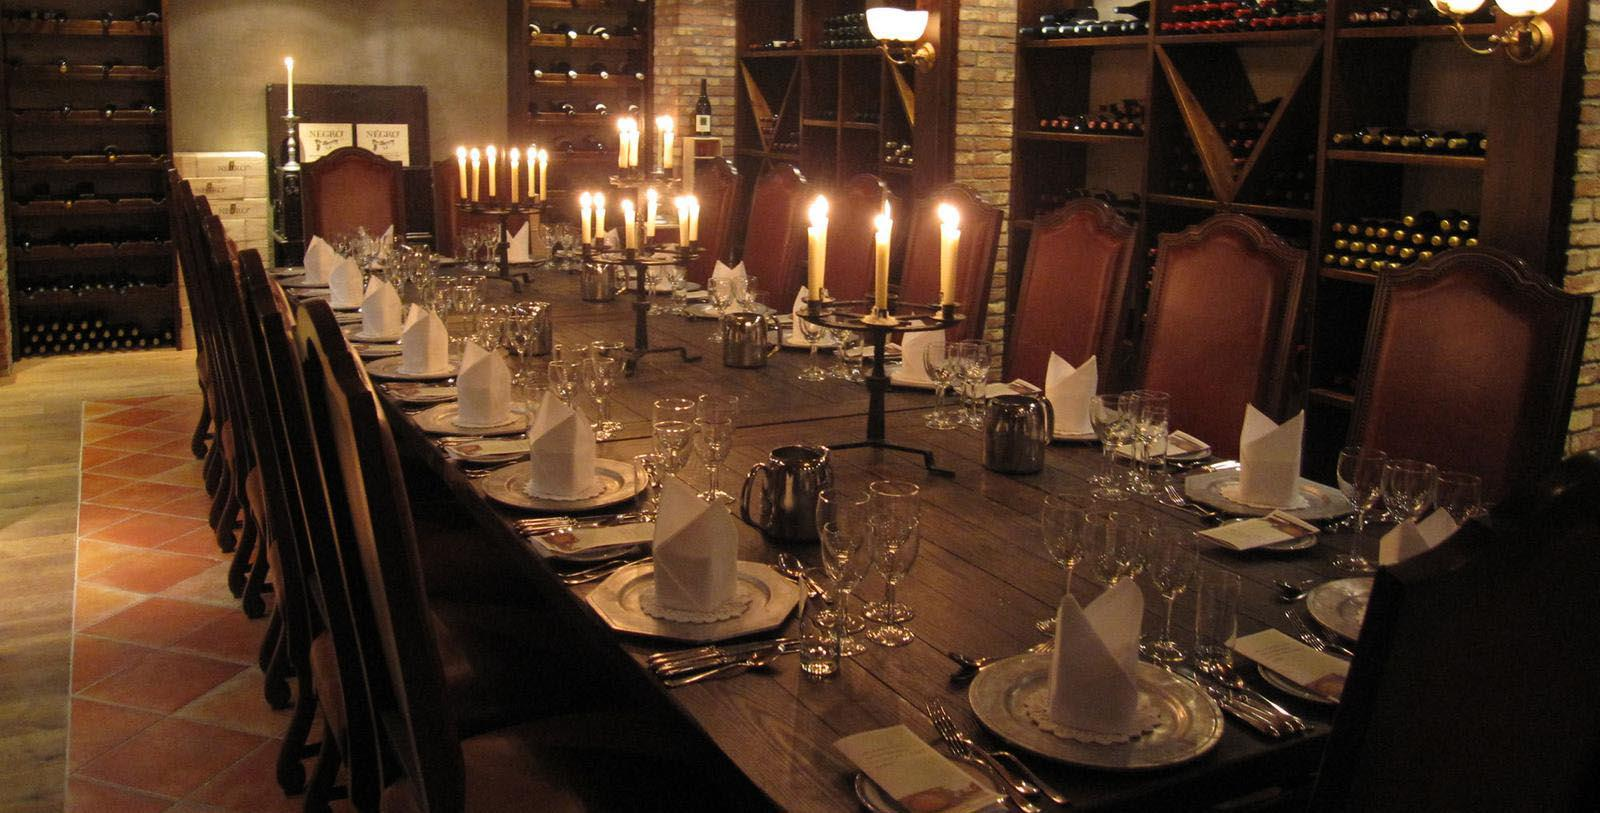 Image of Elegant Meal in Wine Cellar Losby Gods, 1744, Member of Historic Hotels Worldwide, in Finstadjordet, Norway, Taste